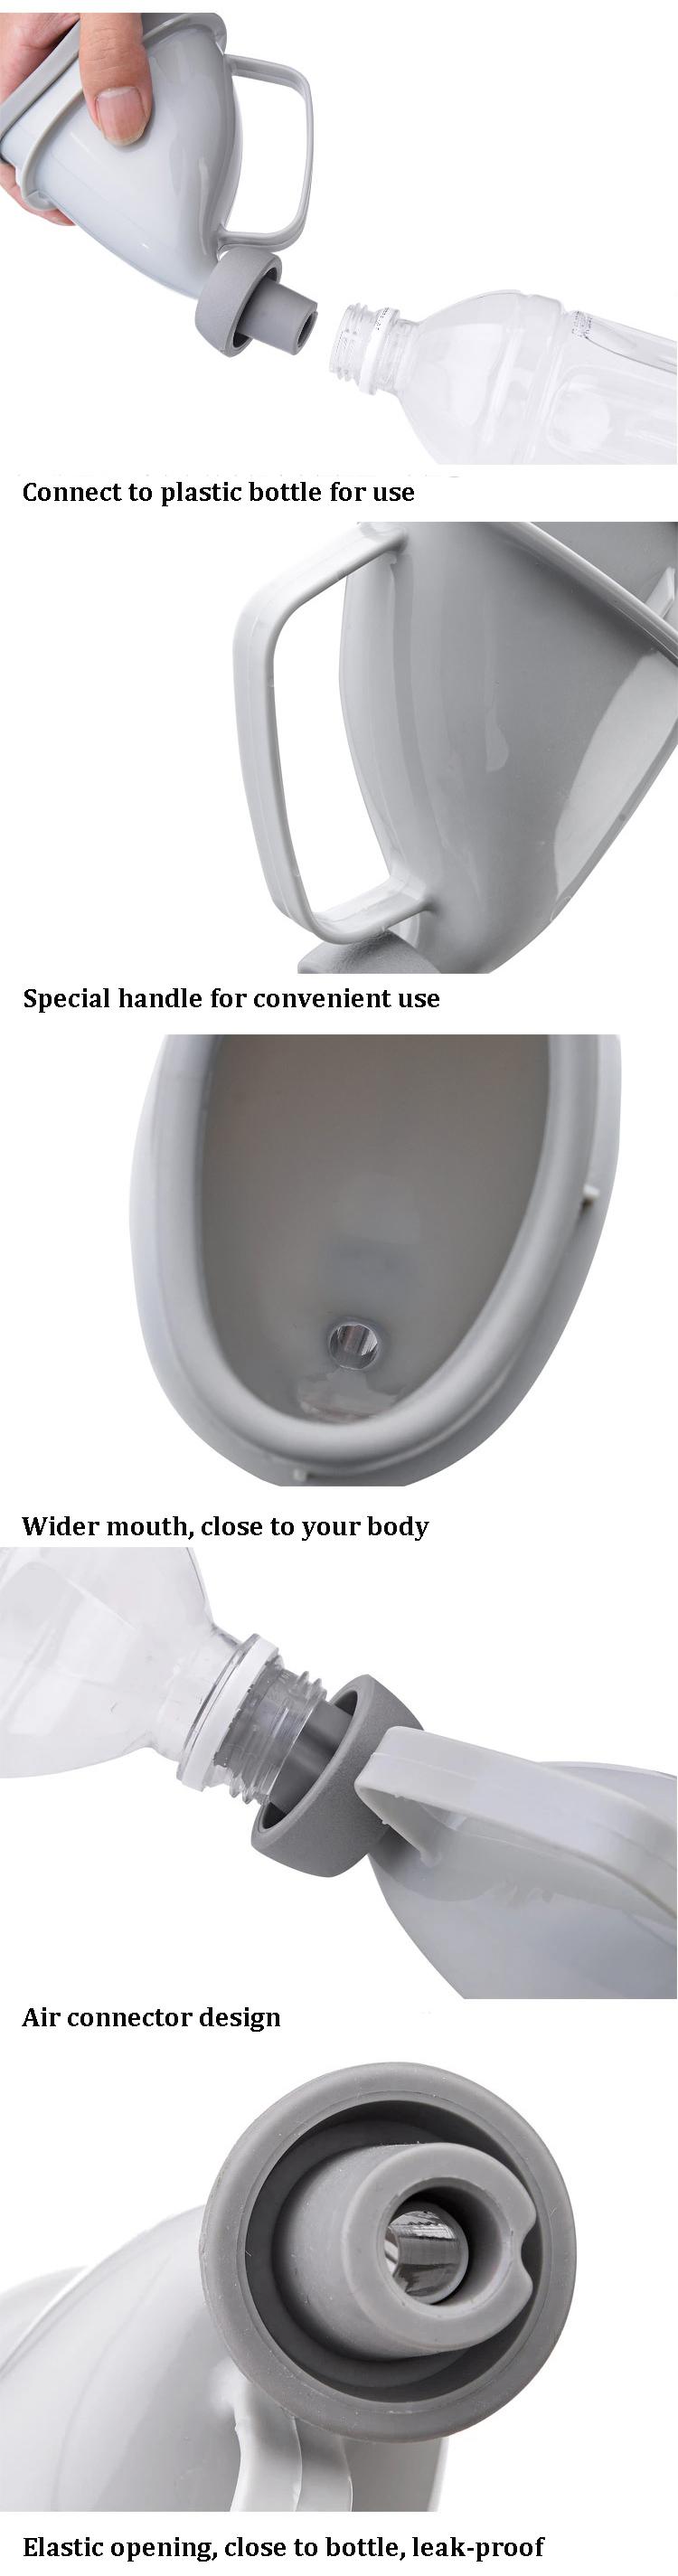 ipree portable erwachsene urinal unisex t pfchen pee. Black Bedroom Furniture Sets. Home Design Ideas